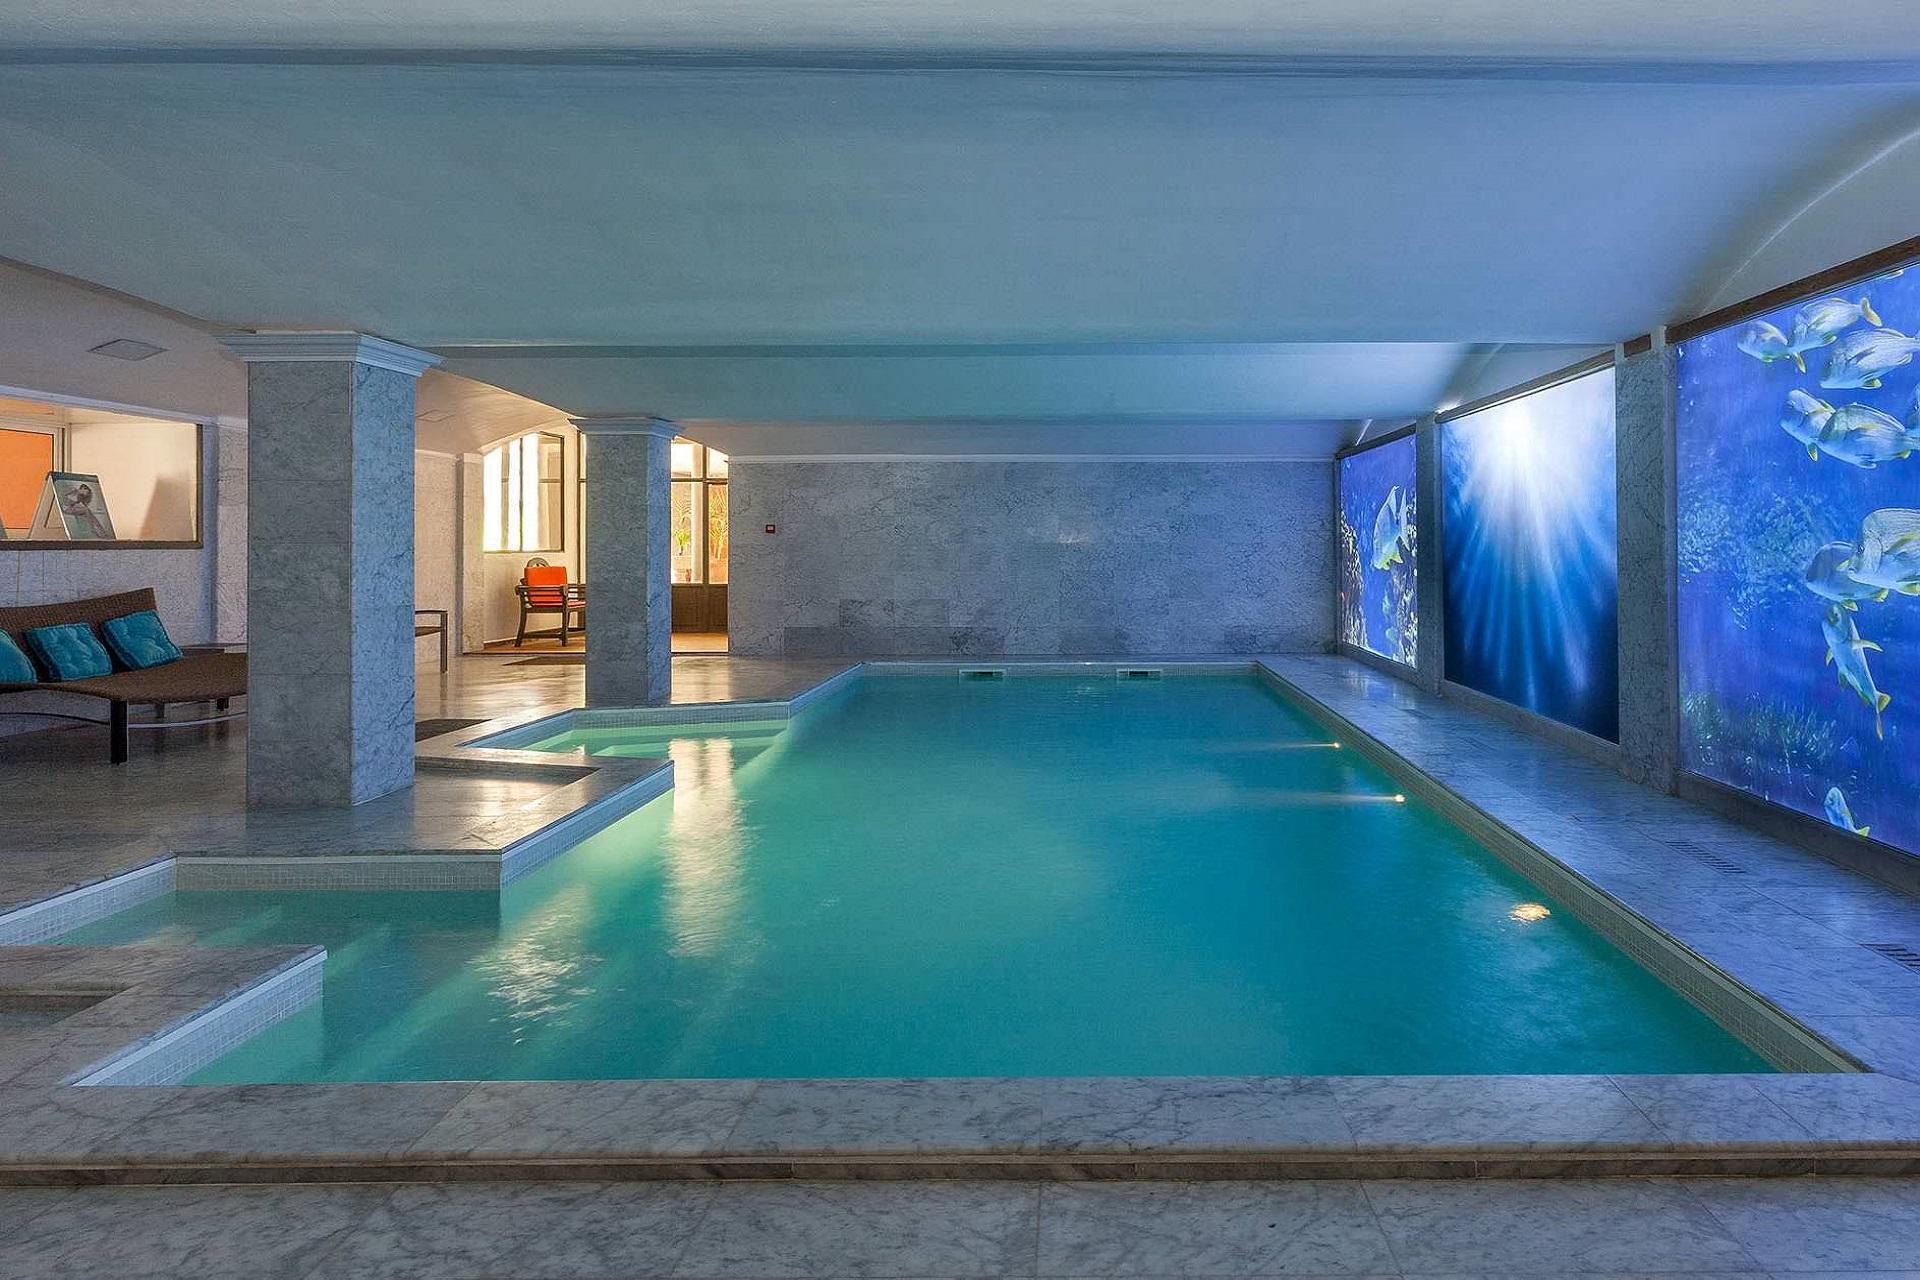 hotel-roi-theodore-et-spa-porto-vecchio-seminaires-de-caractere-piscine-intérieure